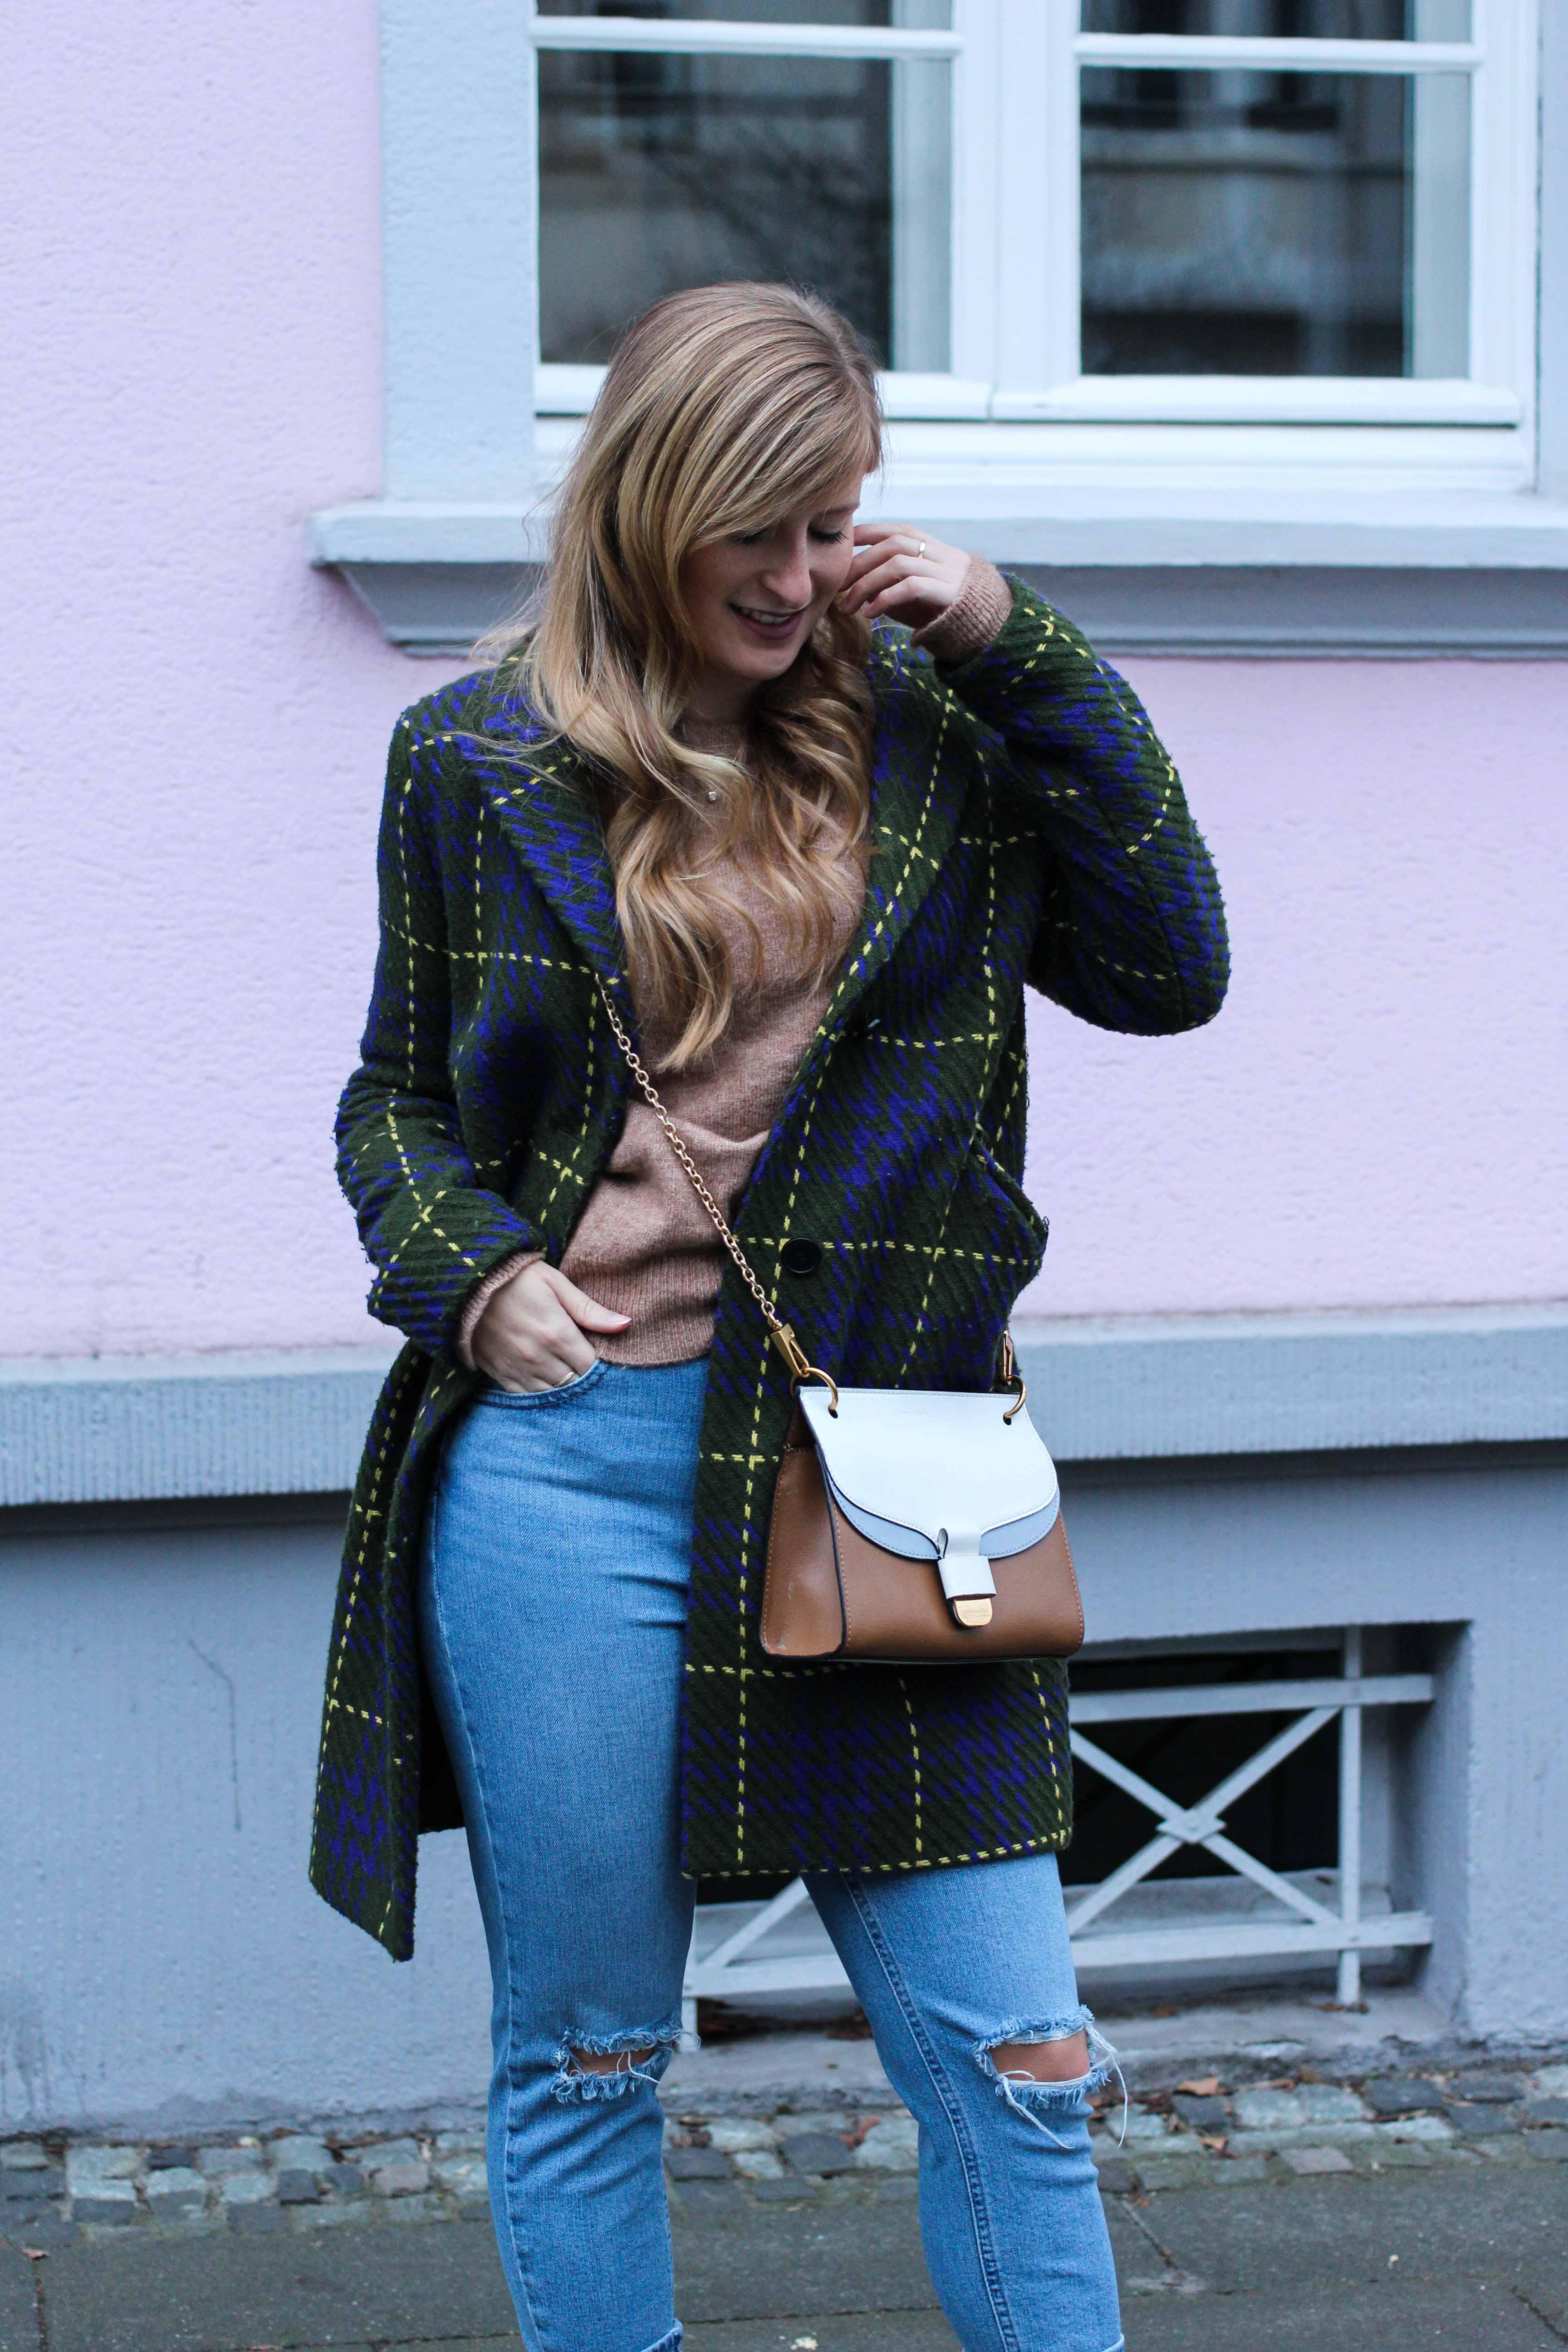 Herbst Must-Have 2019 Karomantel. Herbstmode Herbsttrend Mantel karriert Modeblog Outfit Herbst Fashion Blog Bonn 2